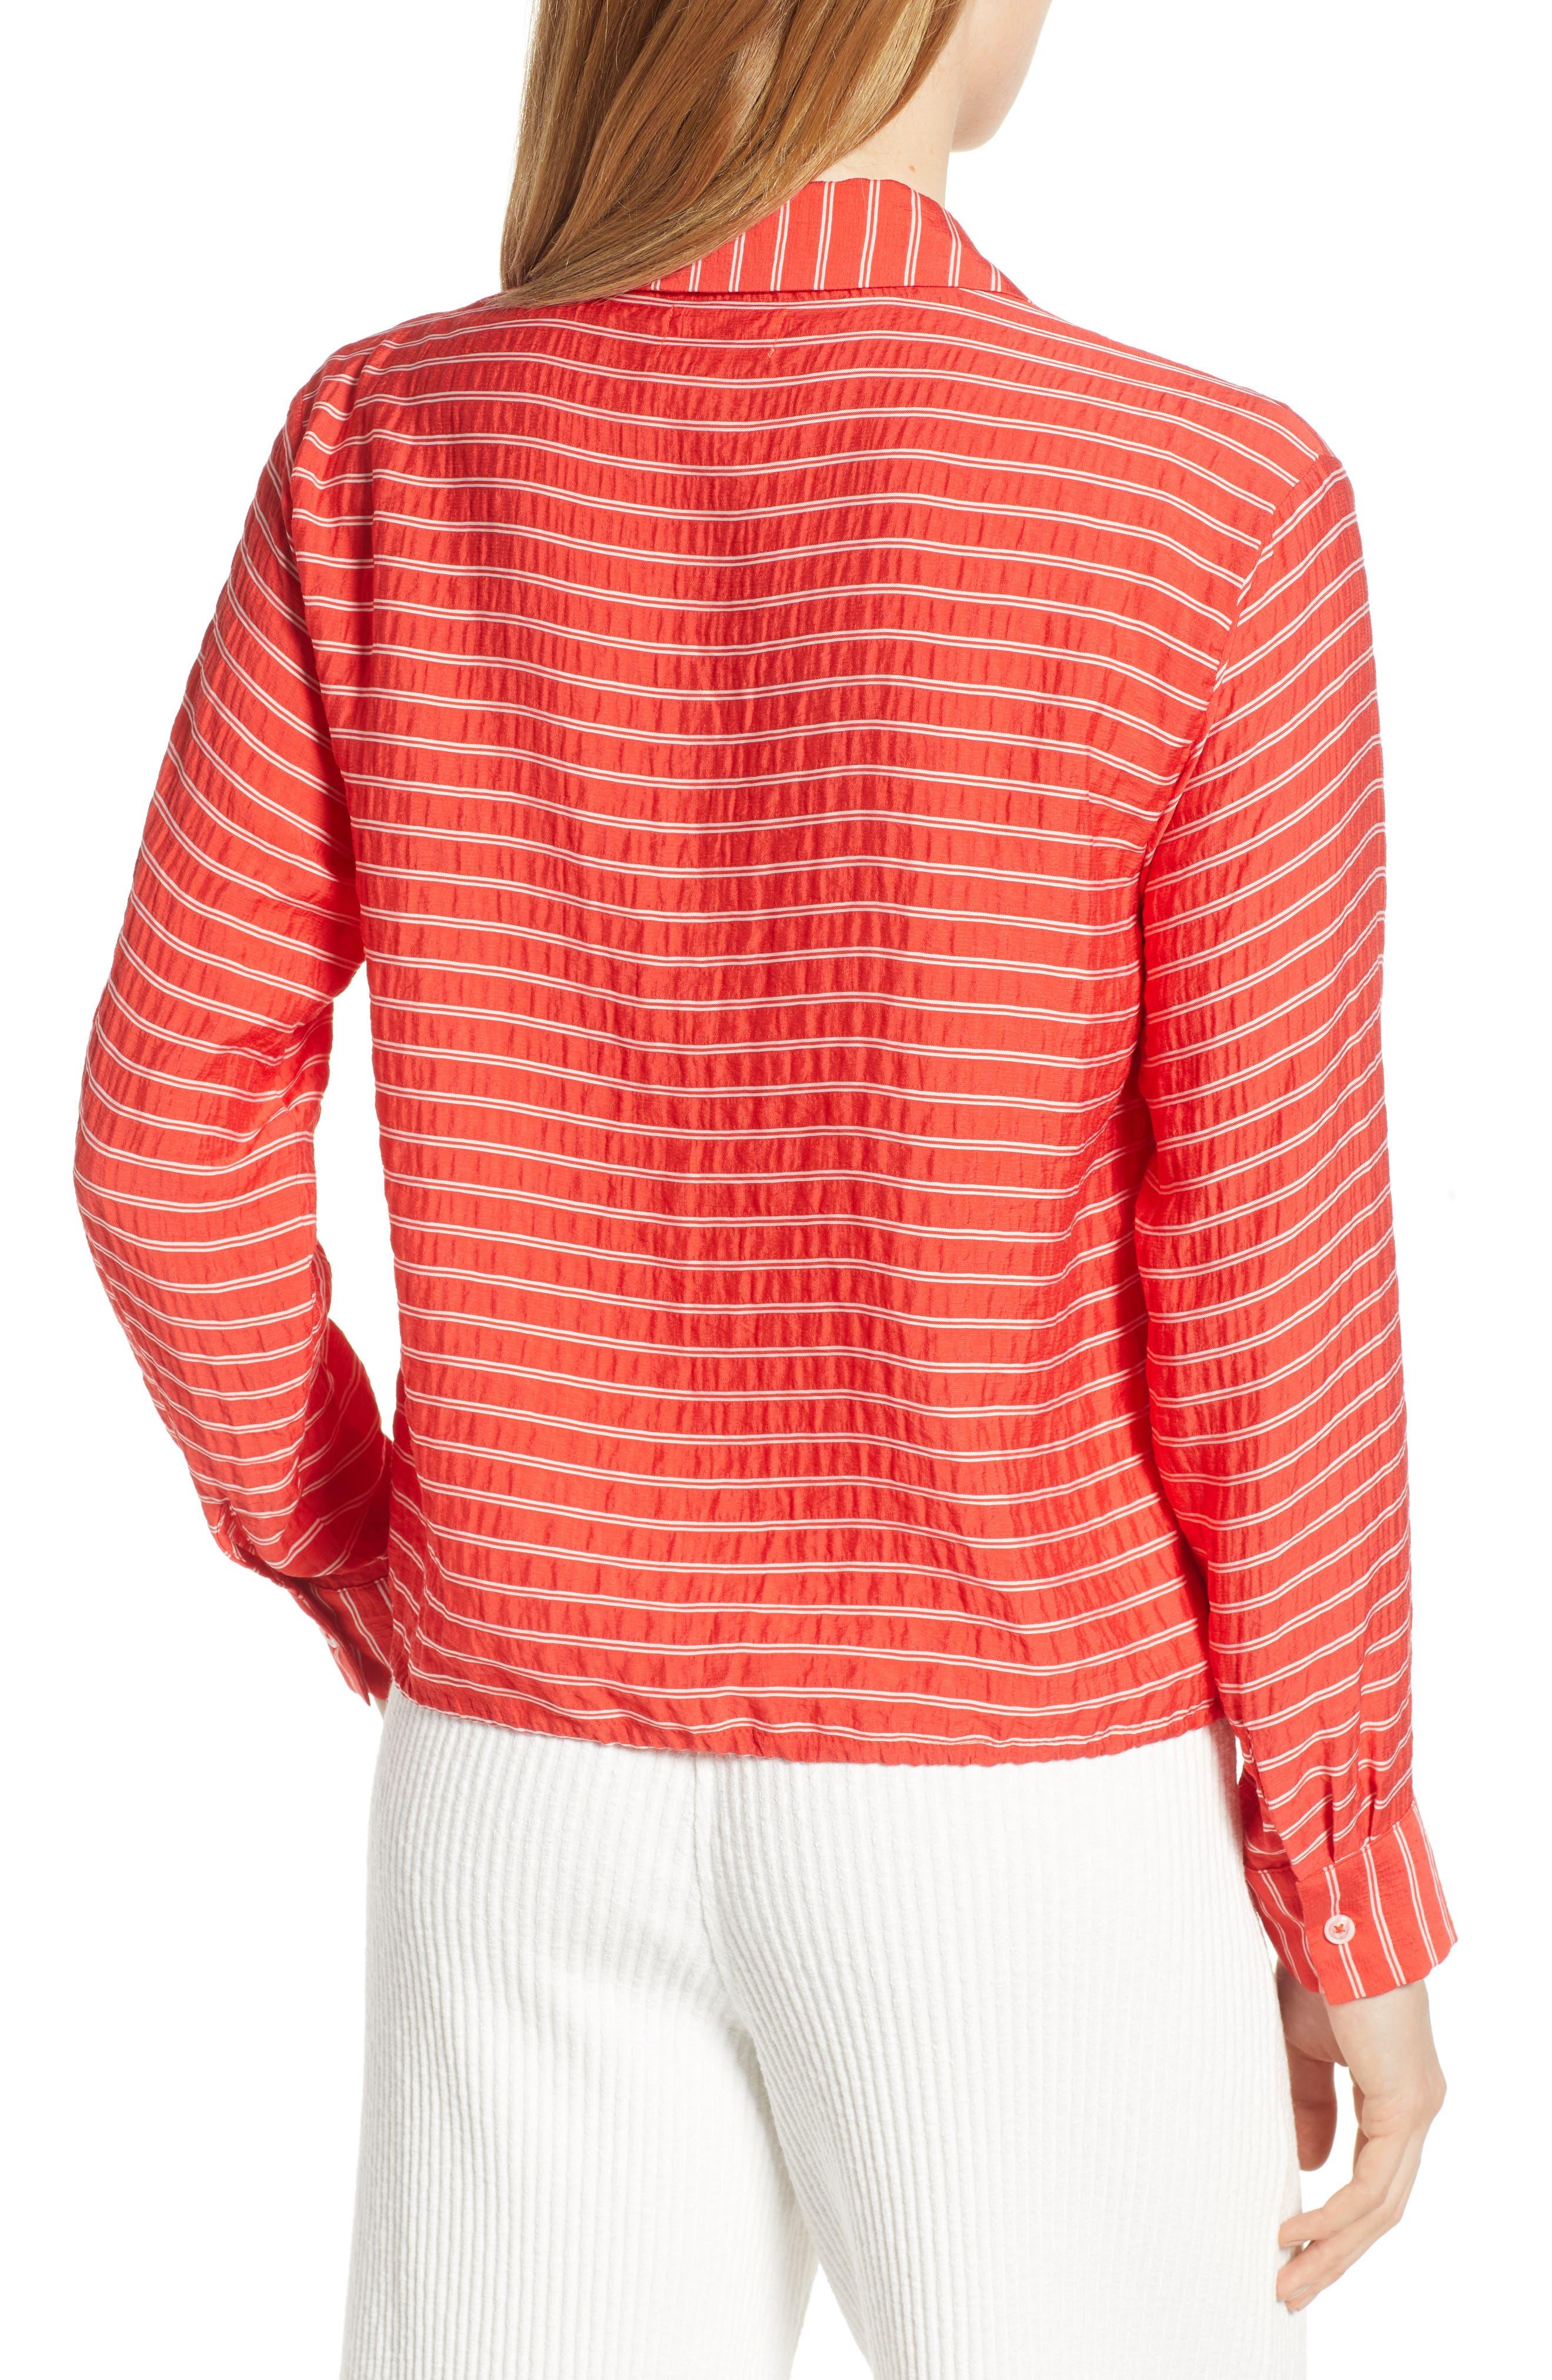 LOU & GREY, Sunny Stripe Drawstring Waist Blouse, Alternate thumbnail 2, color, 600